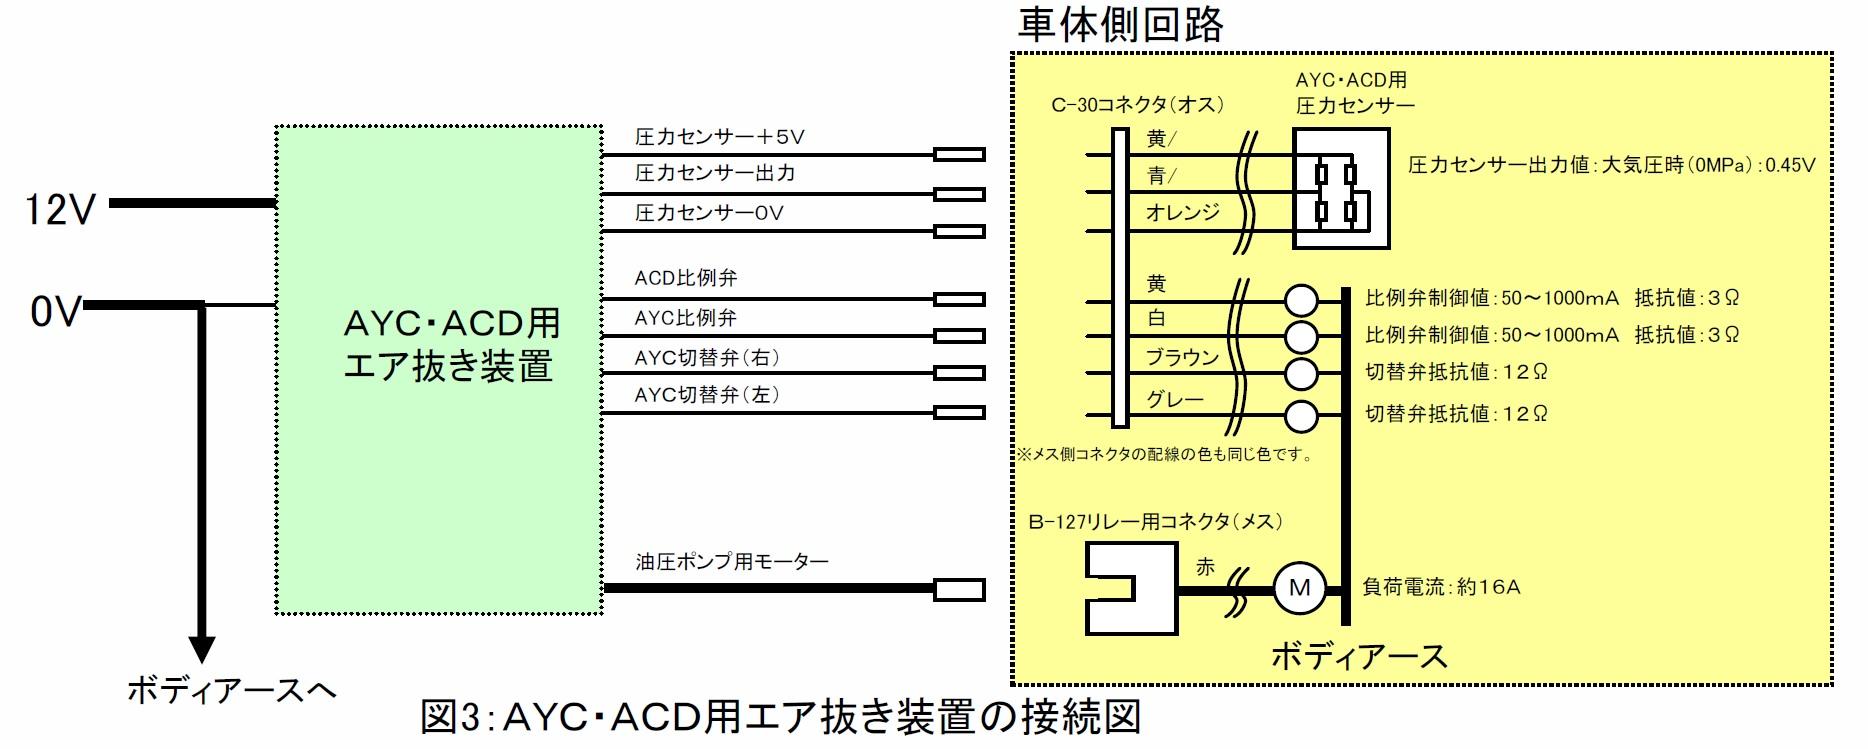 【DIY】 AYC・ACDエア抜き装置作成 その①